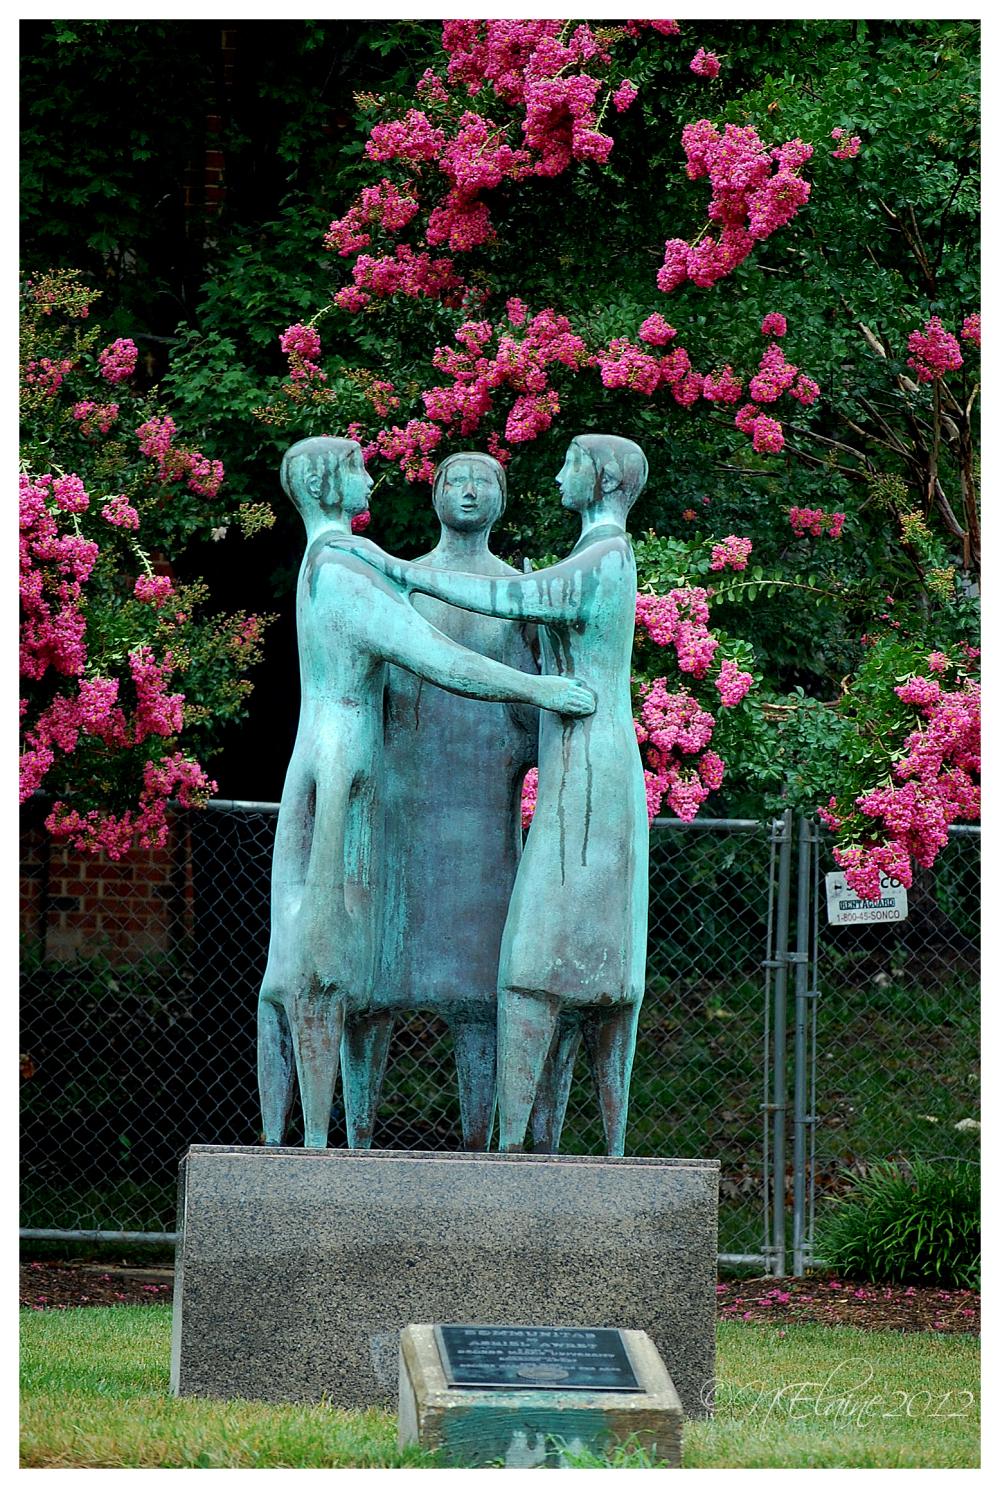 sculpture of people